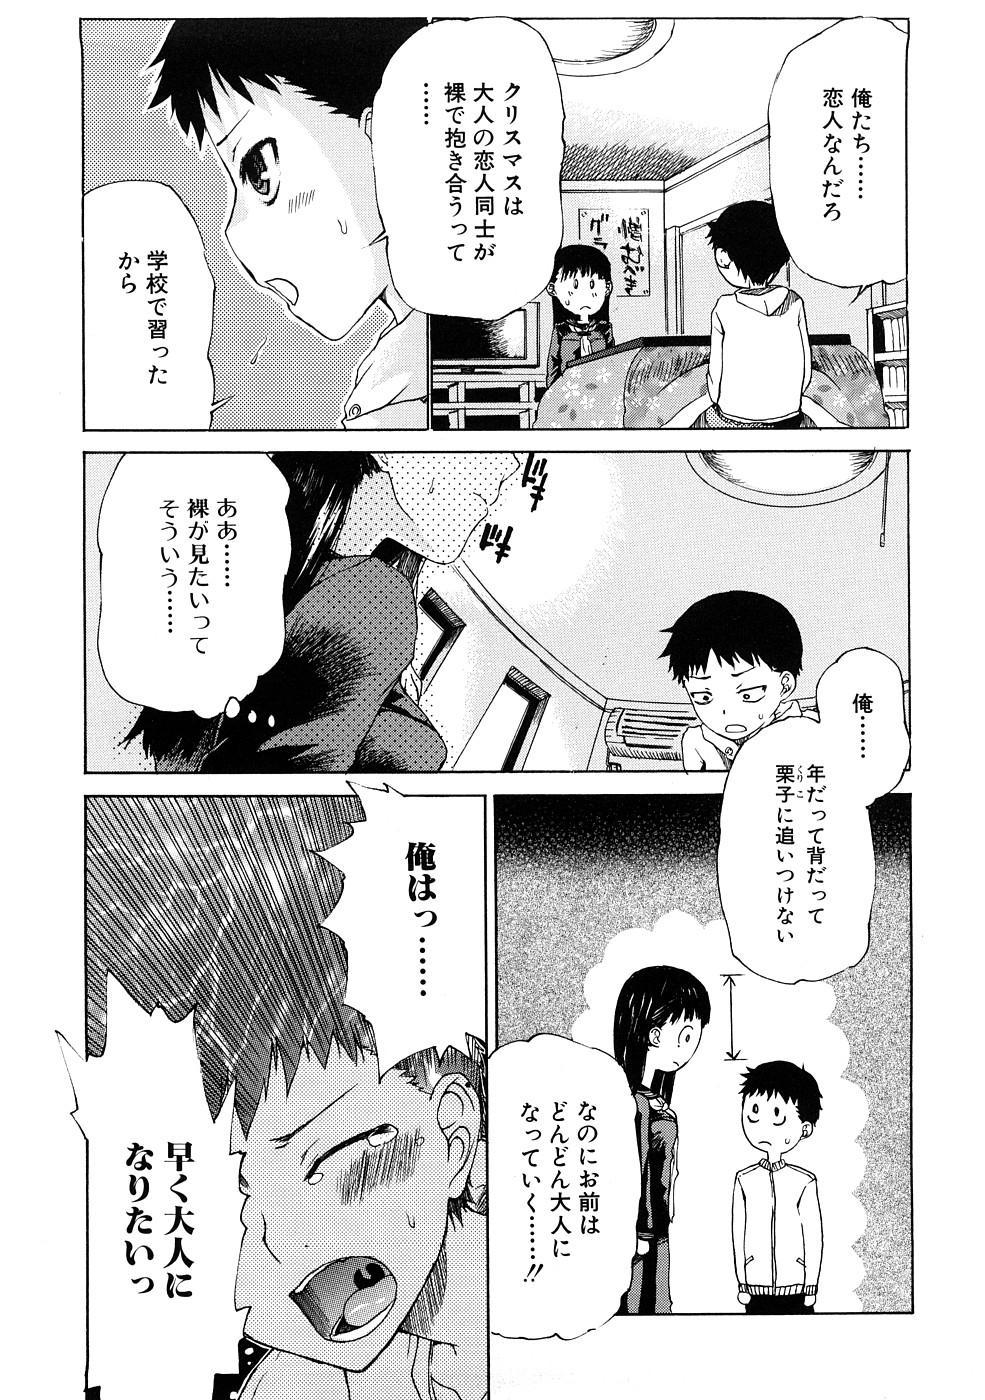 Ecchi de Jibunkatte de Kawaii Ko 69